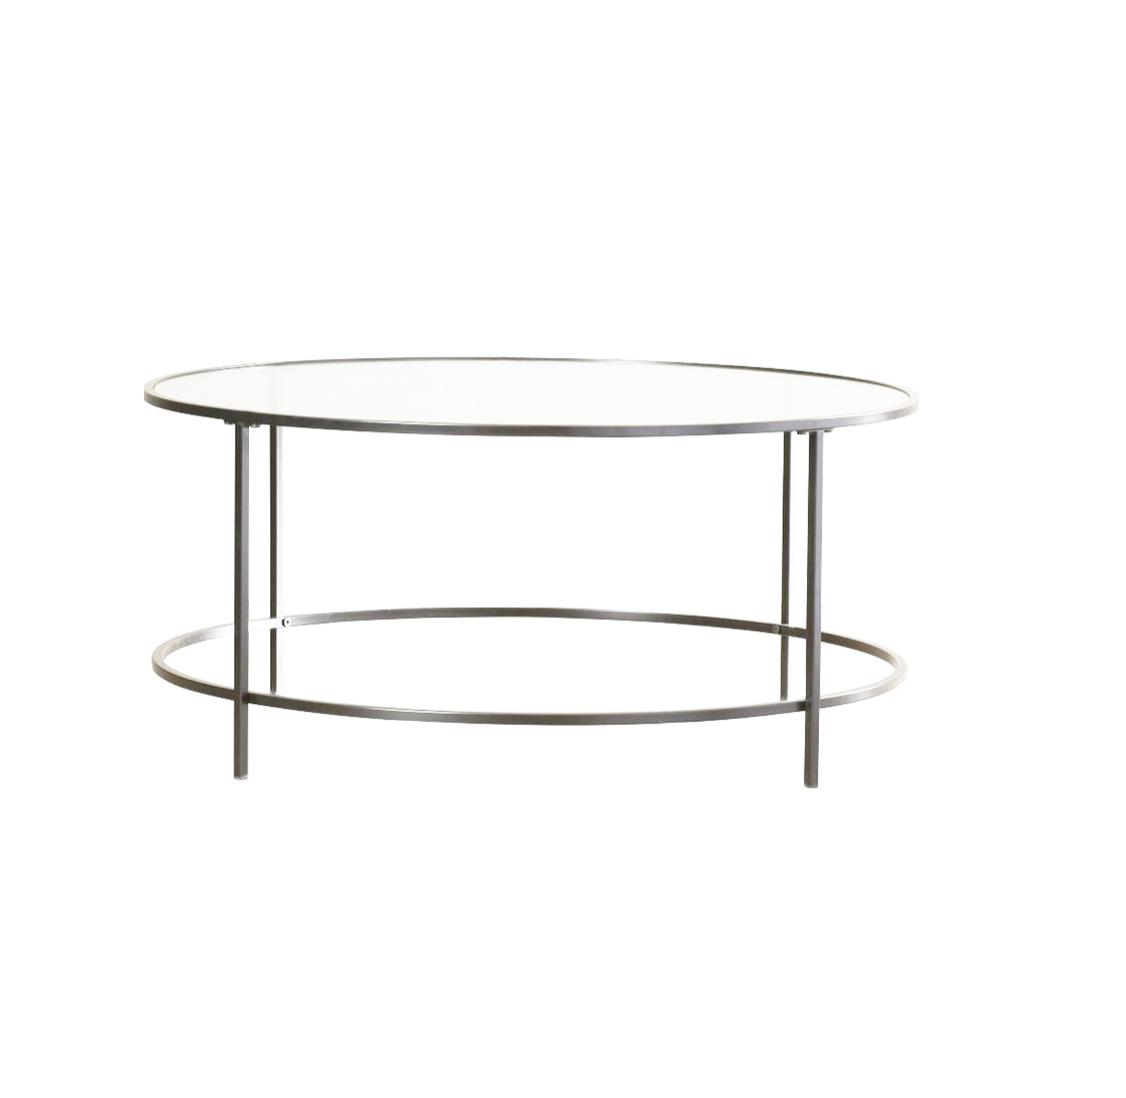 Silver Dean Glass Coffee Table $75